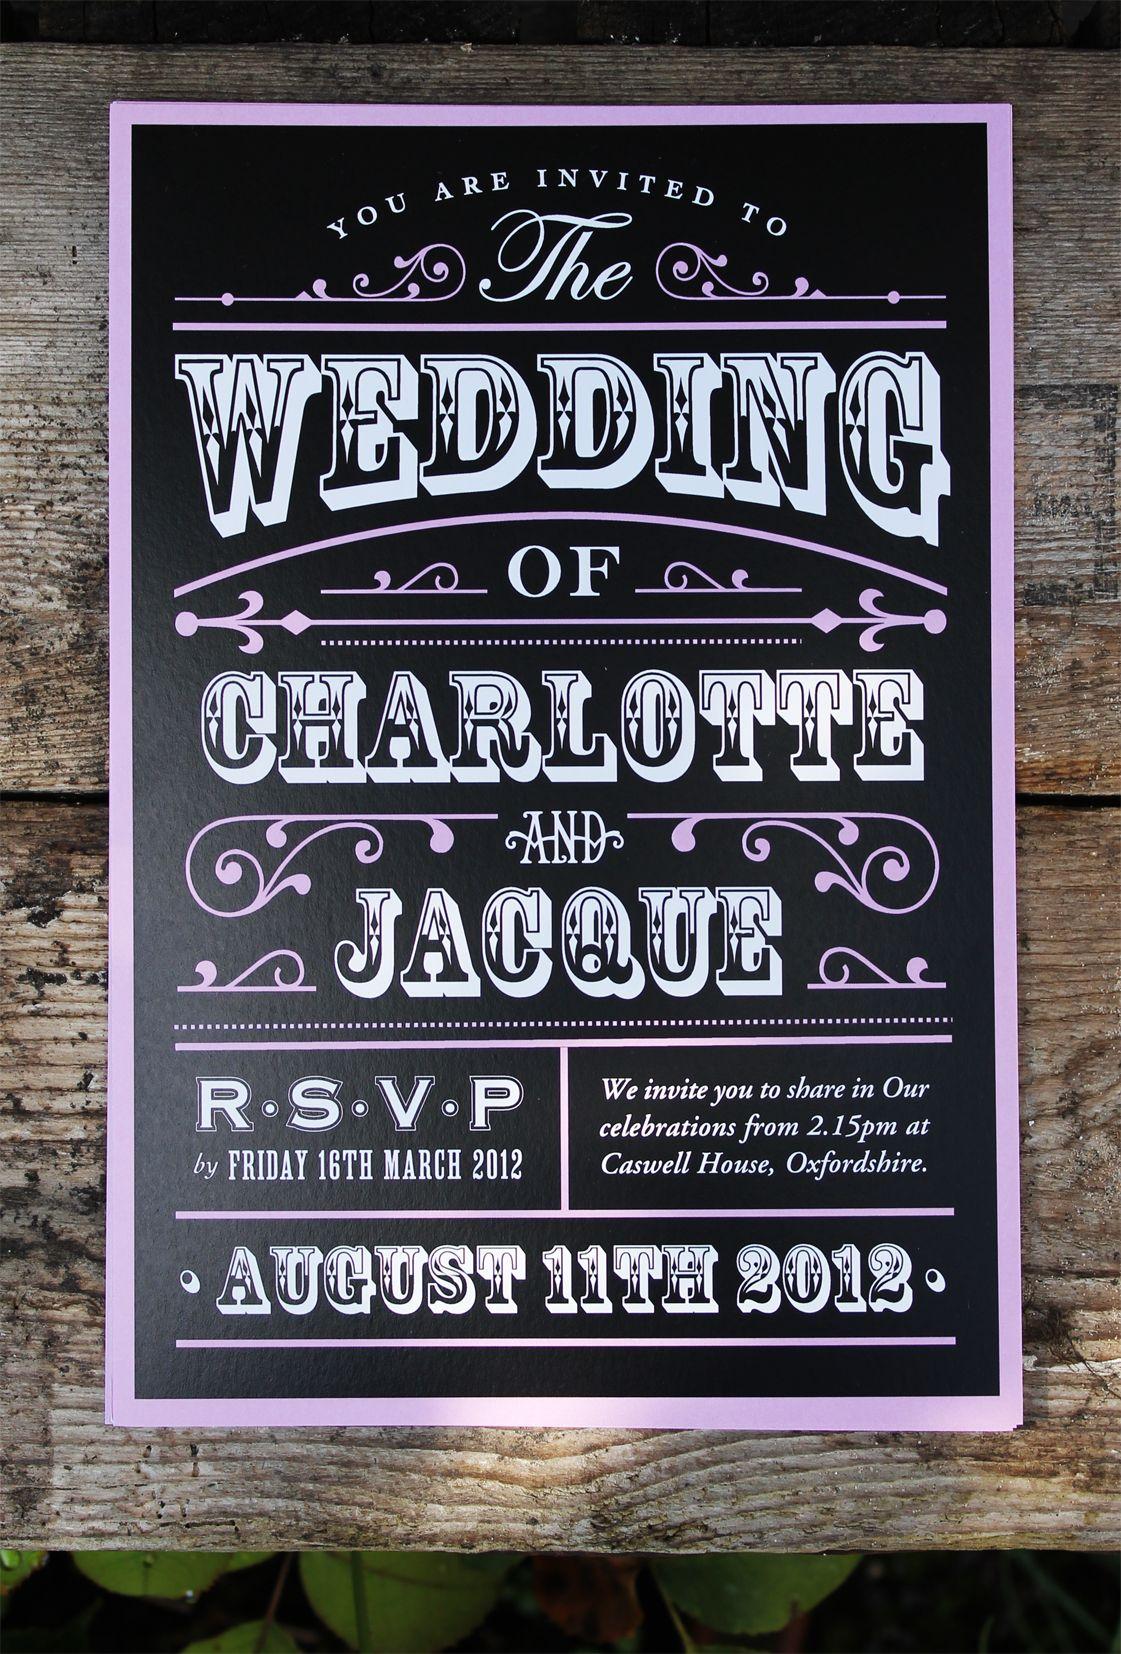 Vintage wedding invitation roll up roll up wedding invitations vintage wedding invitation roll up roll up monicamarmolfo Choice Image